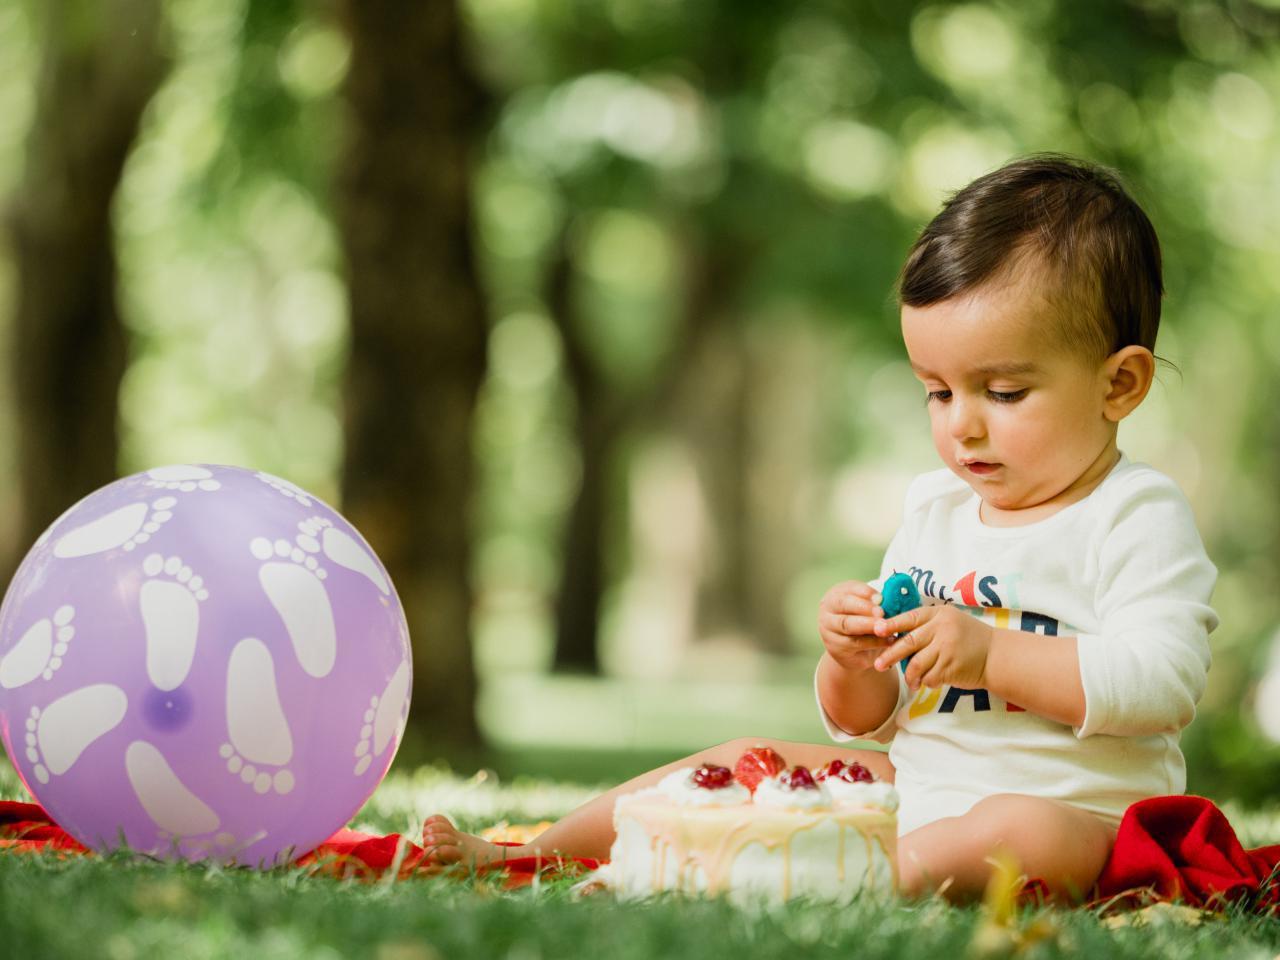 Children-Photography-4.jpg